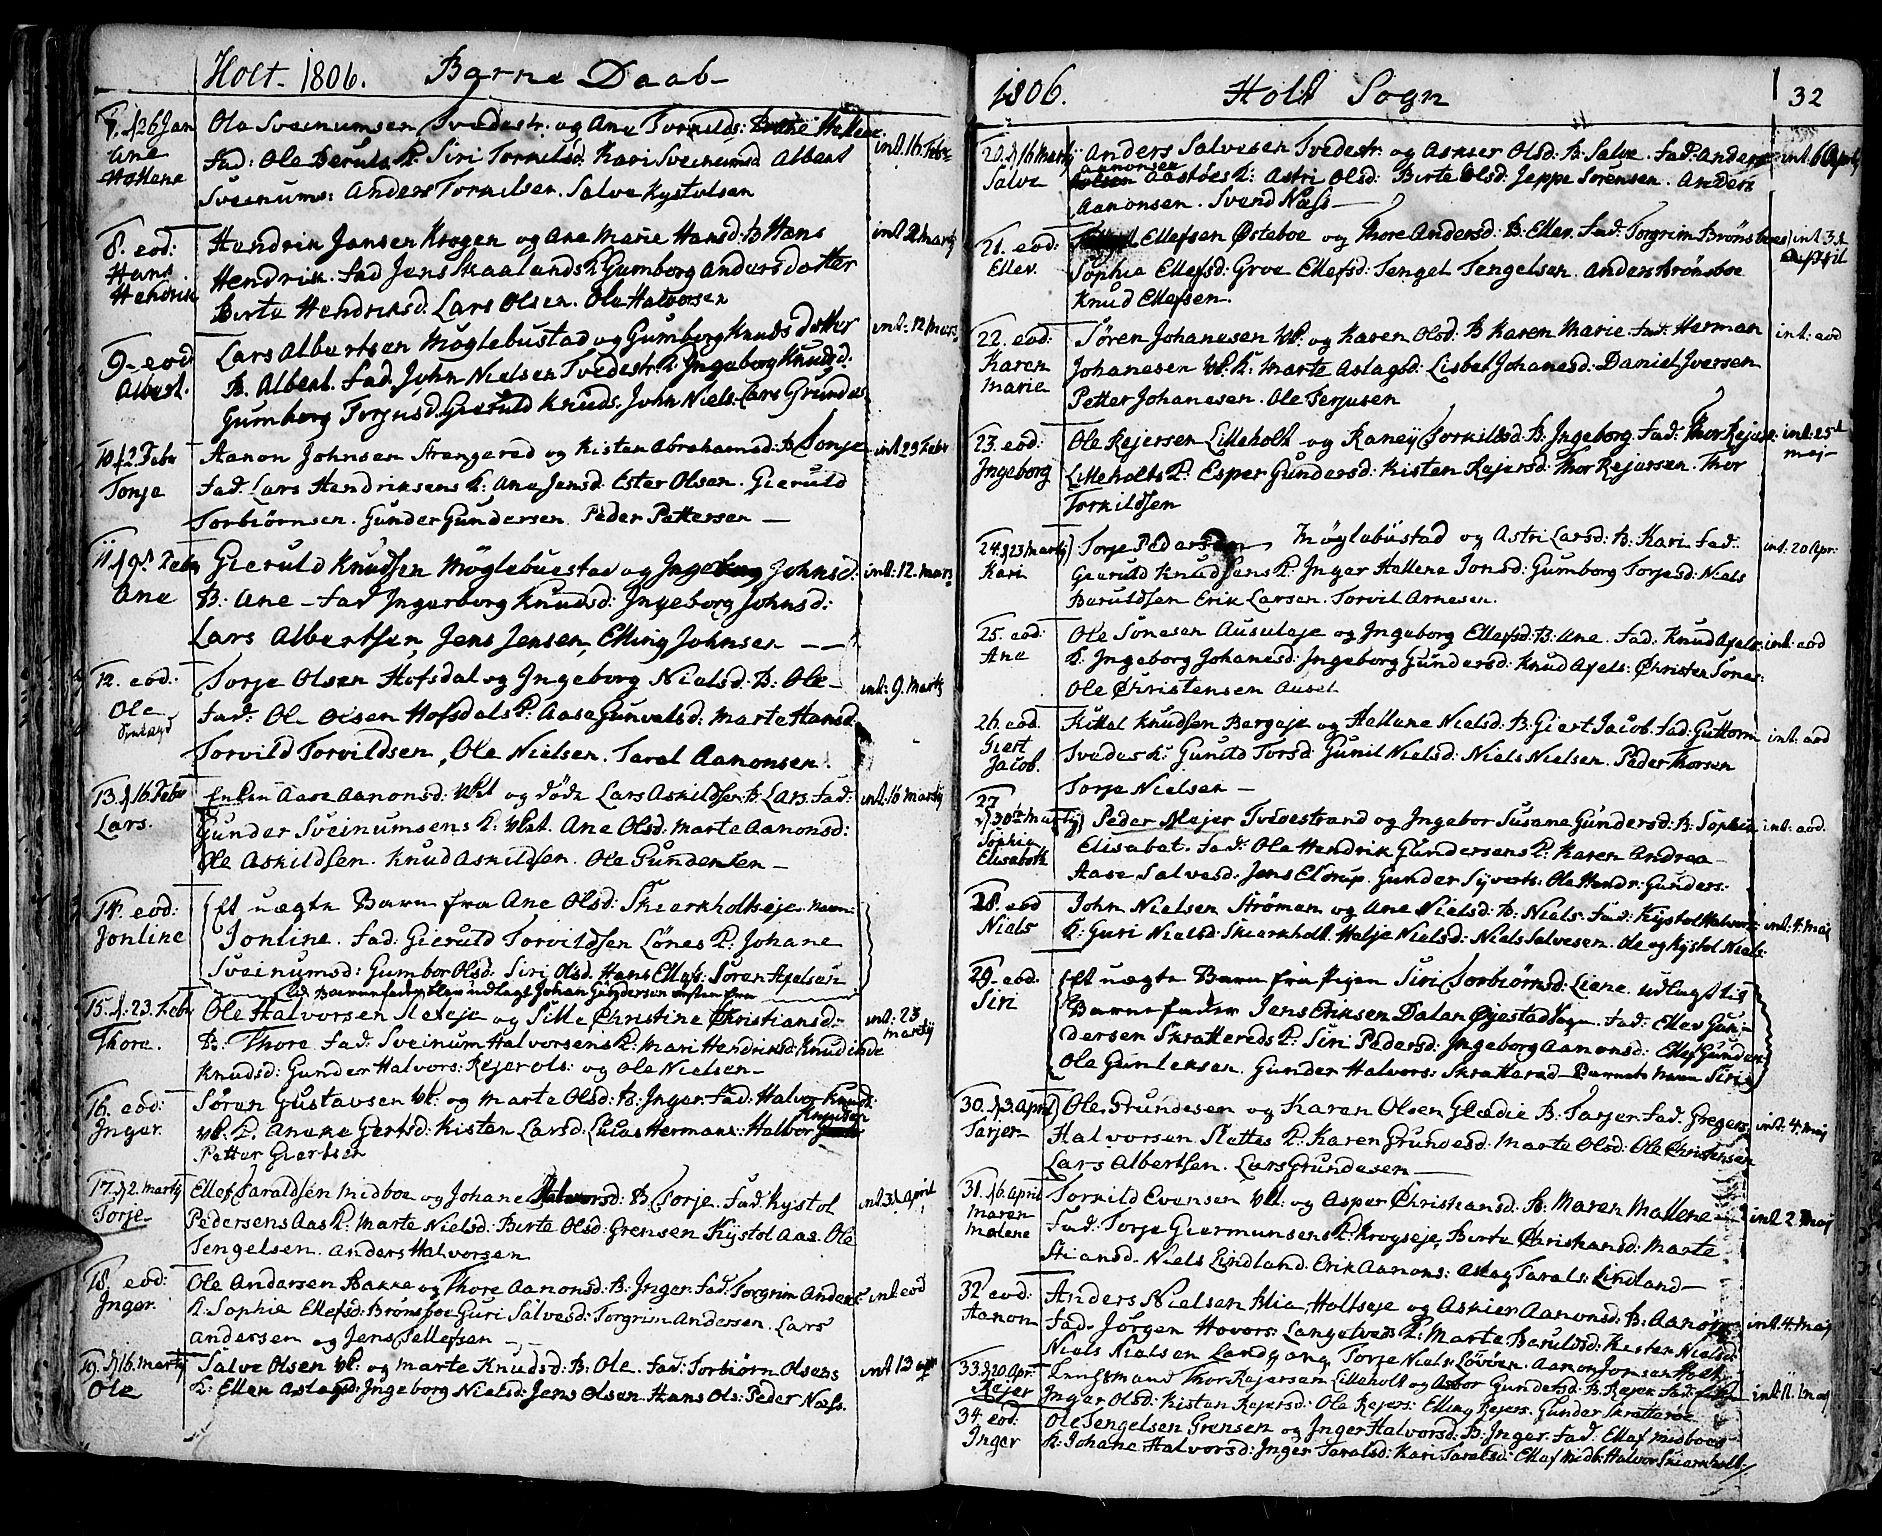 SAK, Holt sokneprestkontor, F/Fa/L0004: Ministerialbok nr. A 4, 1799-1813, s. 32